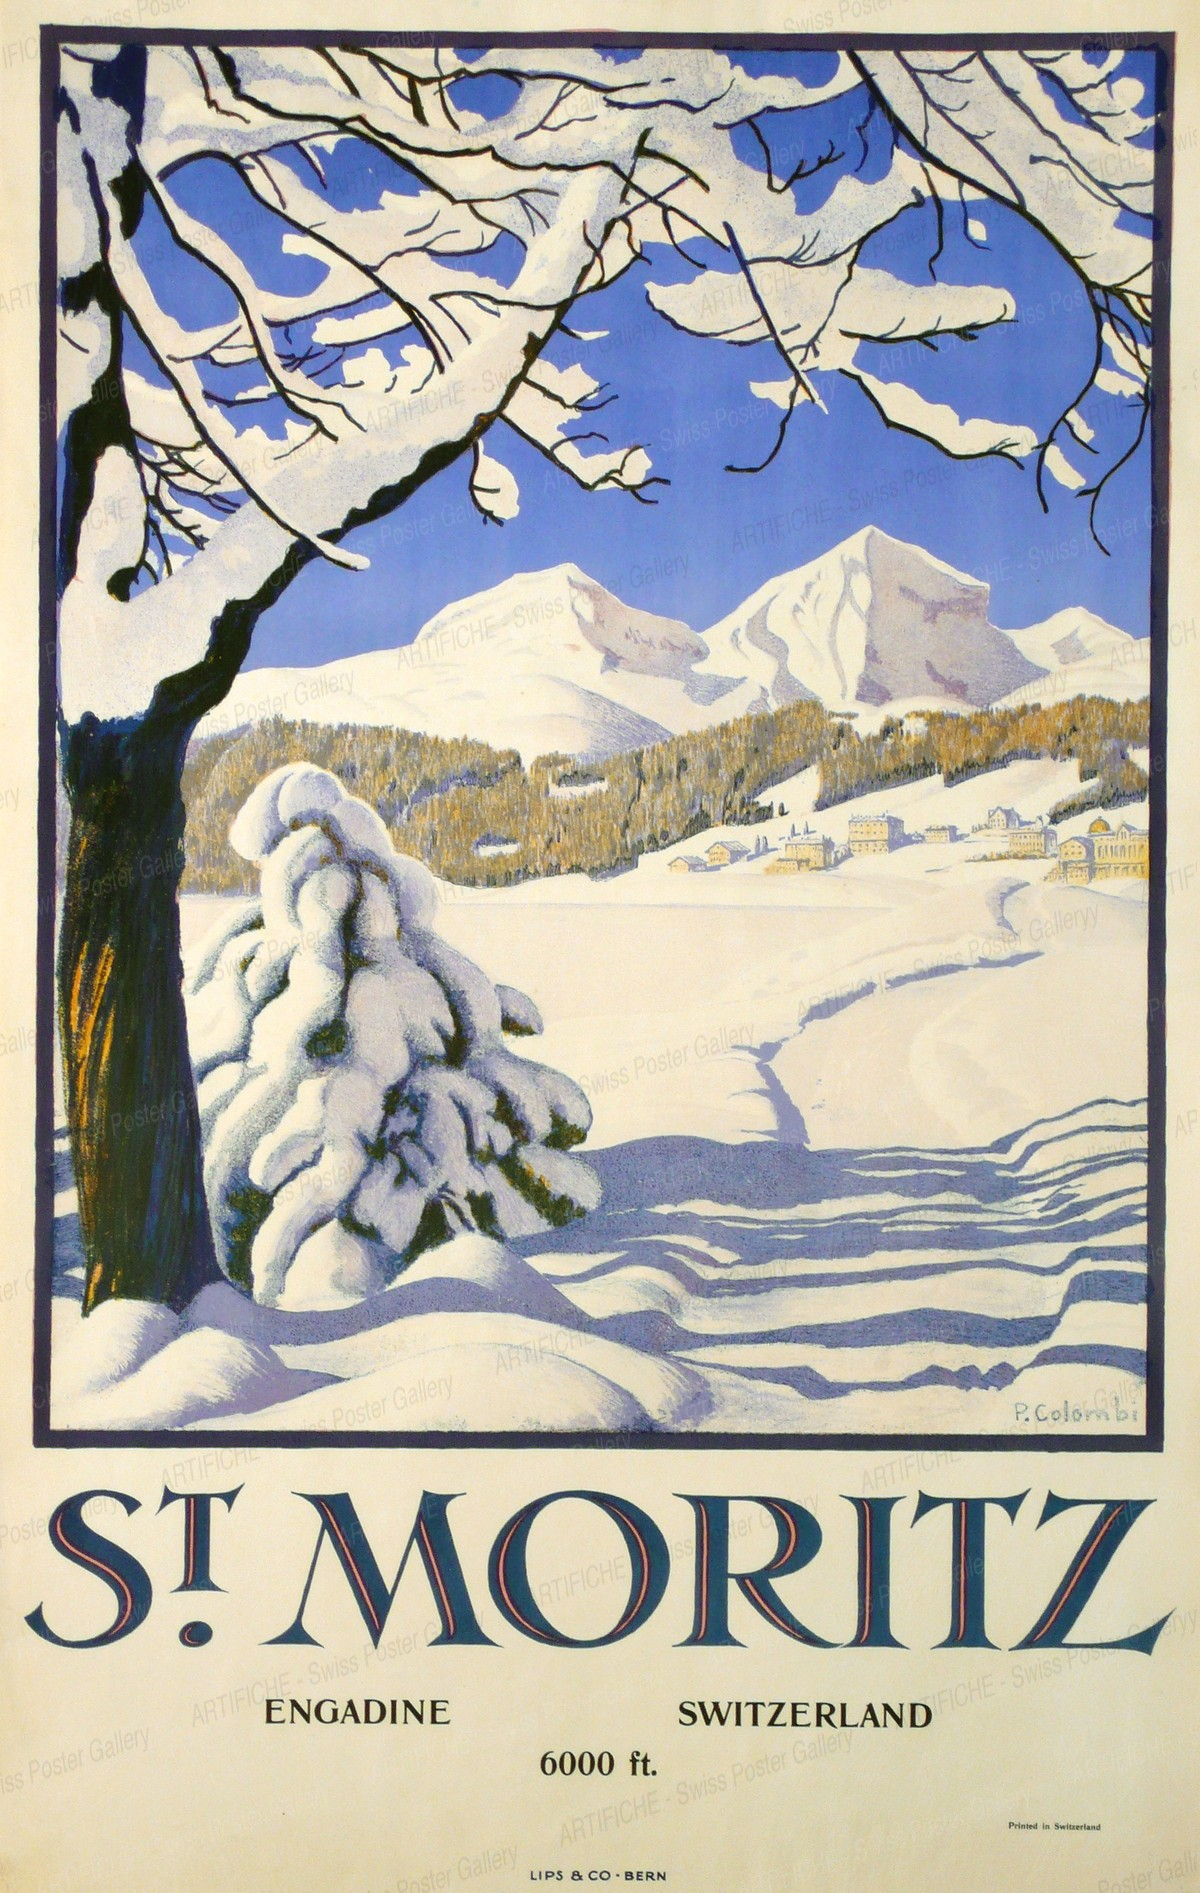 ST. MORITZ – ENGADIN – 6000 ft. SWITZERLAND, Plinio Colombi